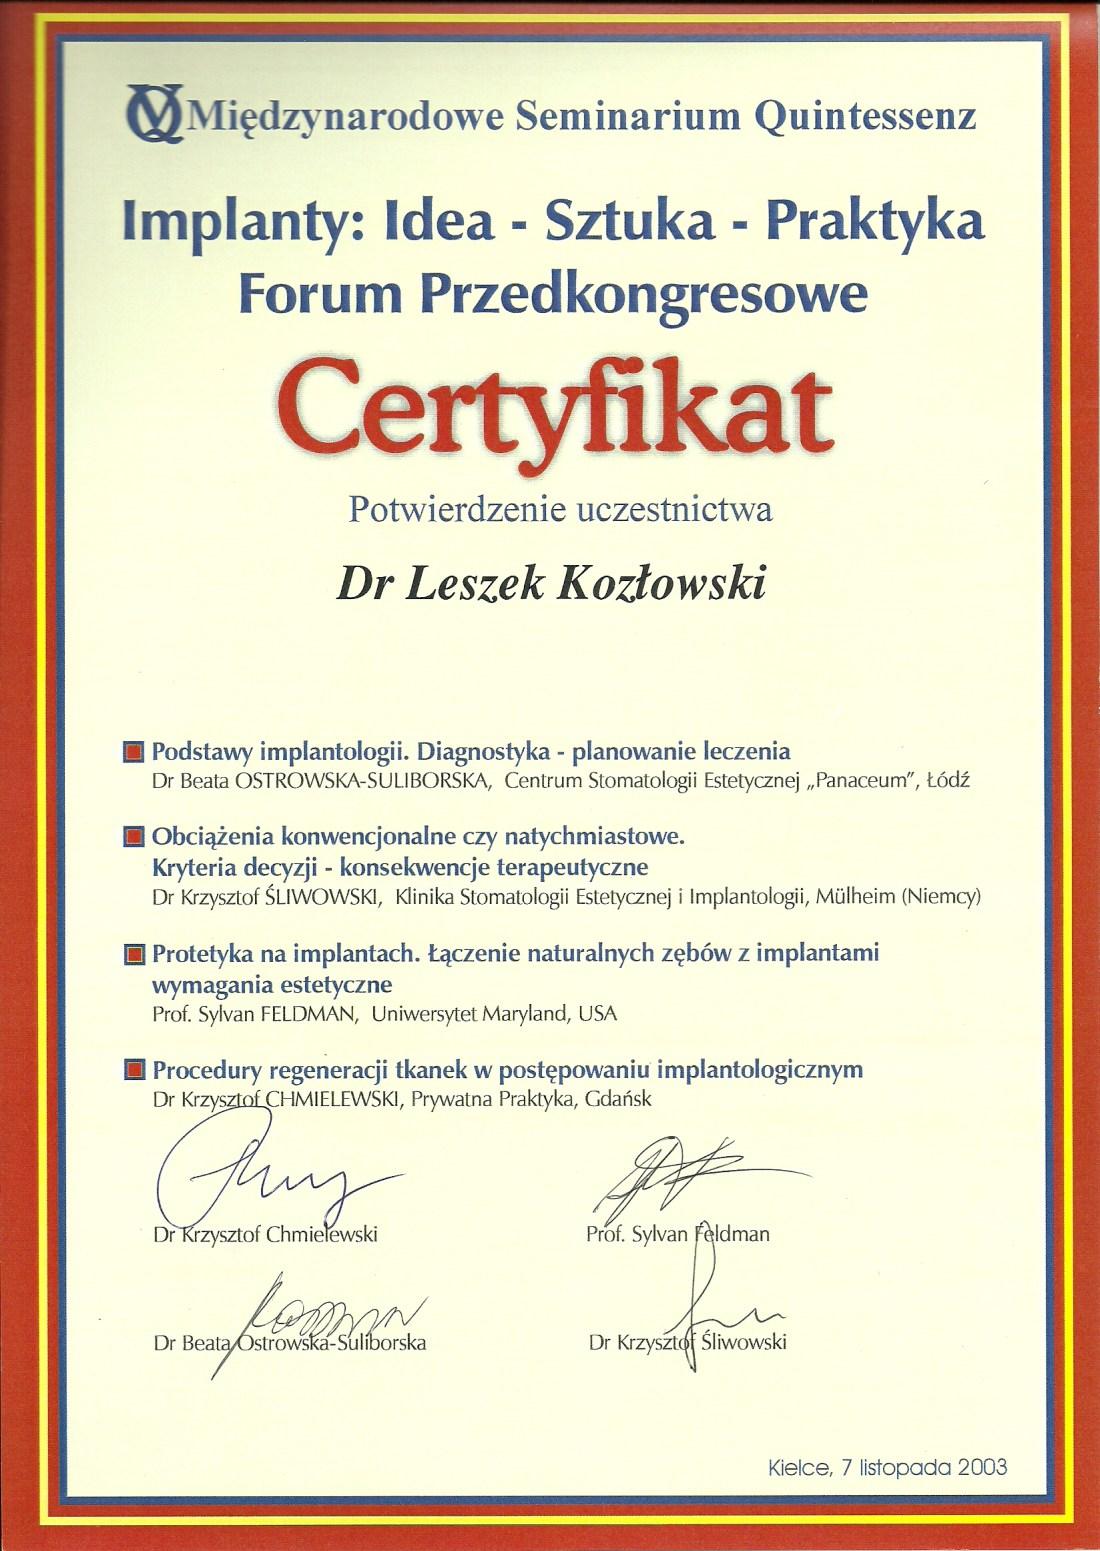 dentysta warszawa DENTYSTA WARSZAWA – DENTOKLINIKA Dentysta warszawa Leszek Kozlowski Certyfikat 17